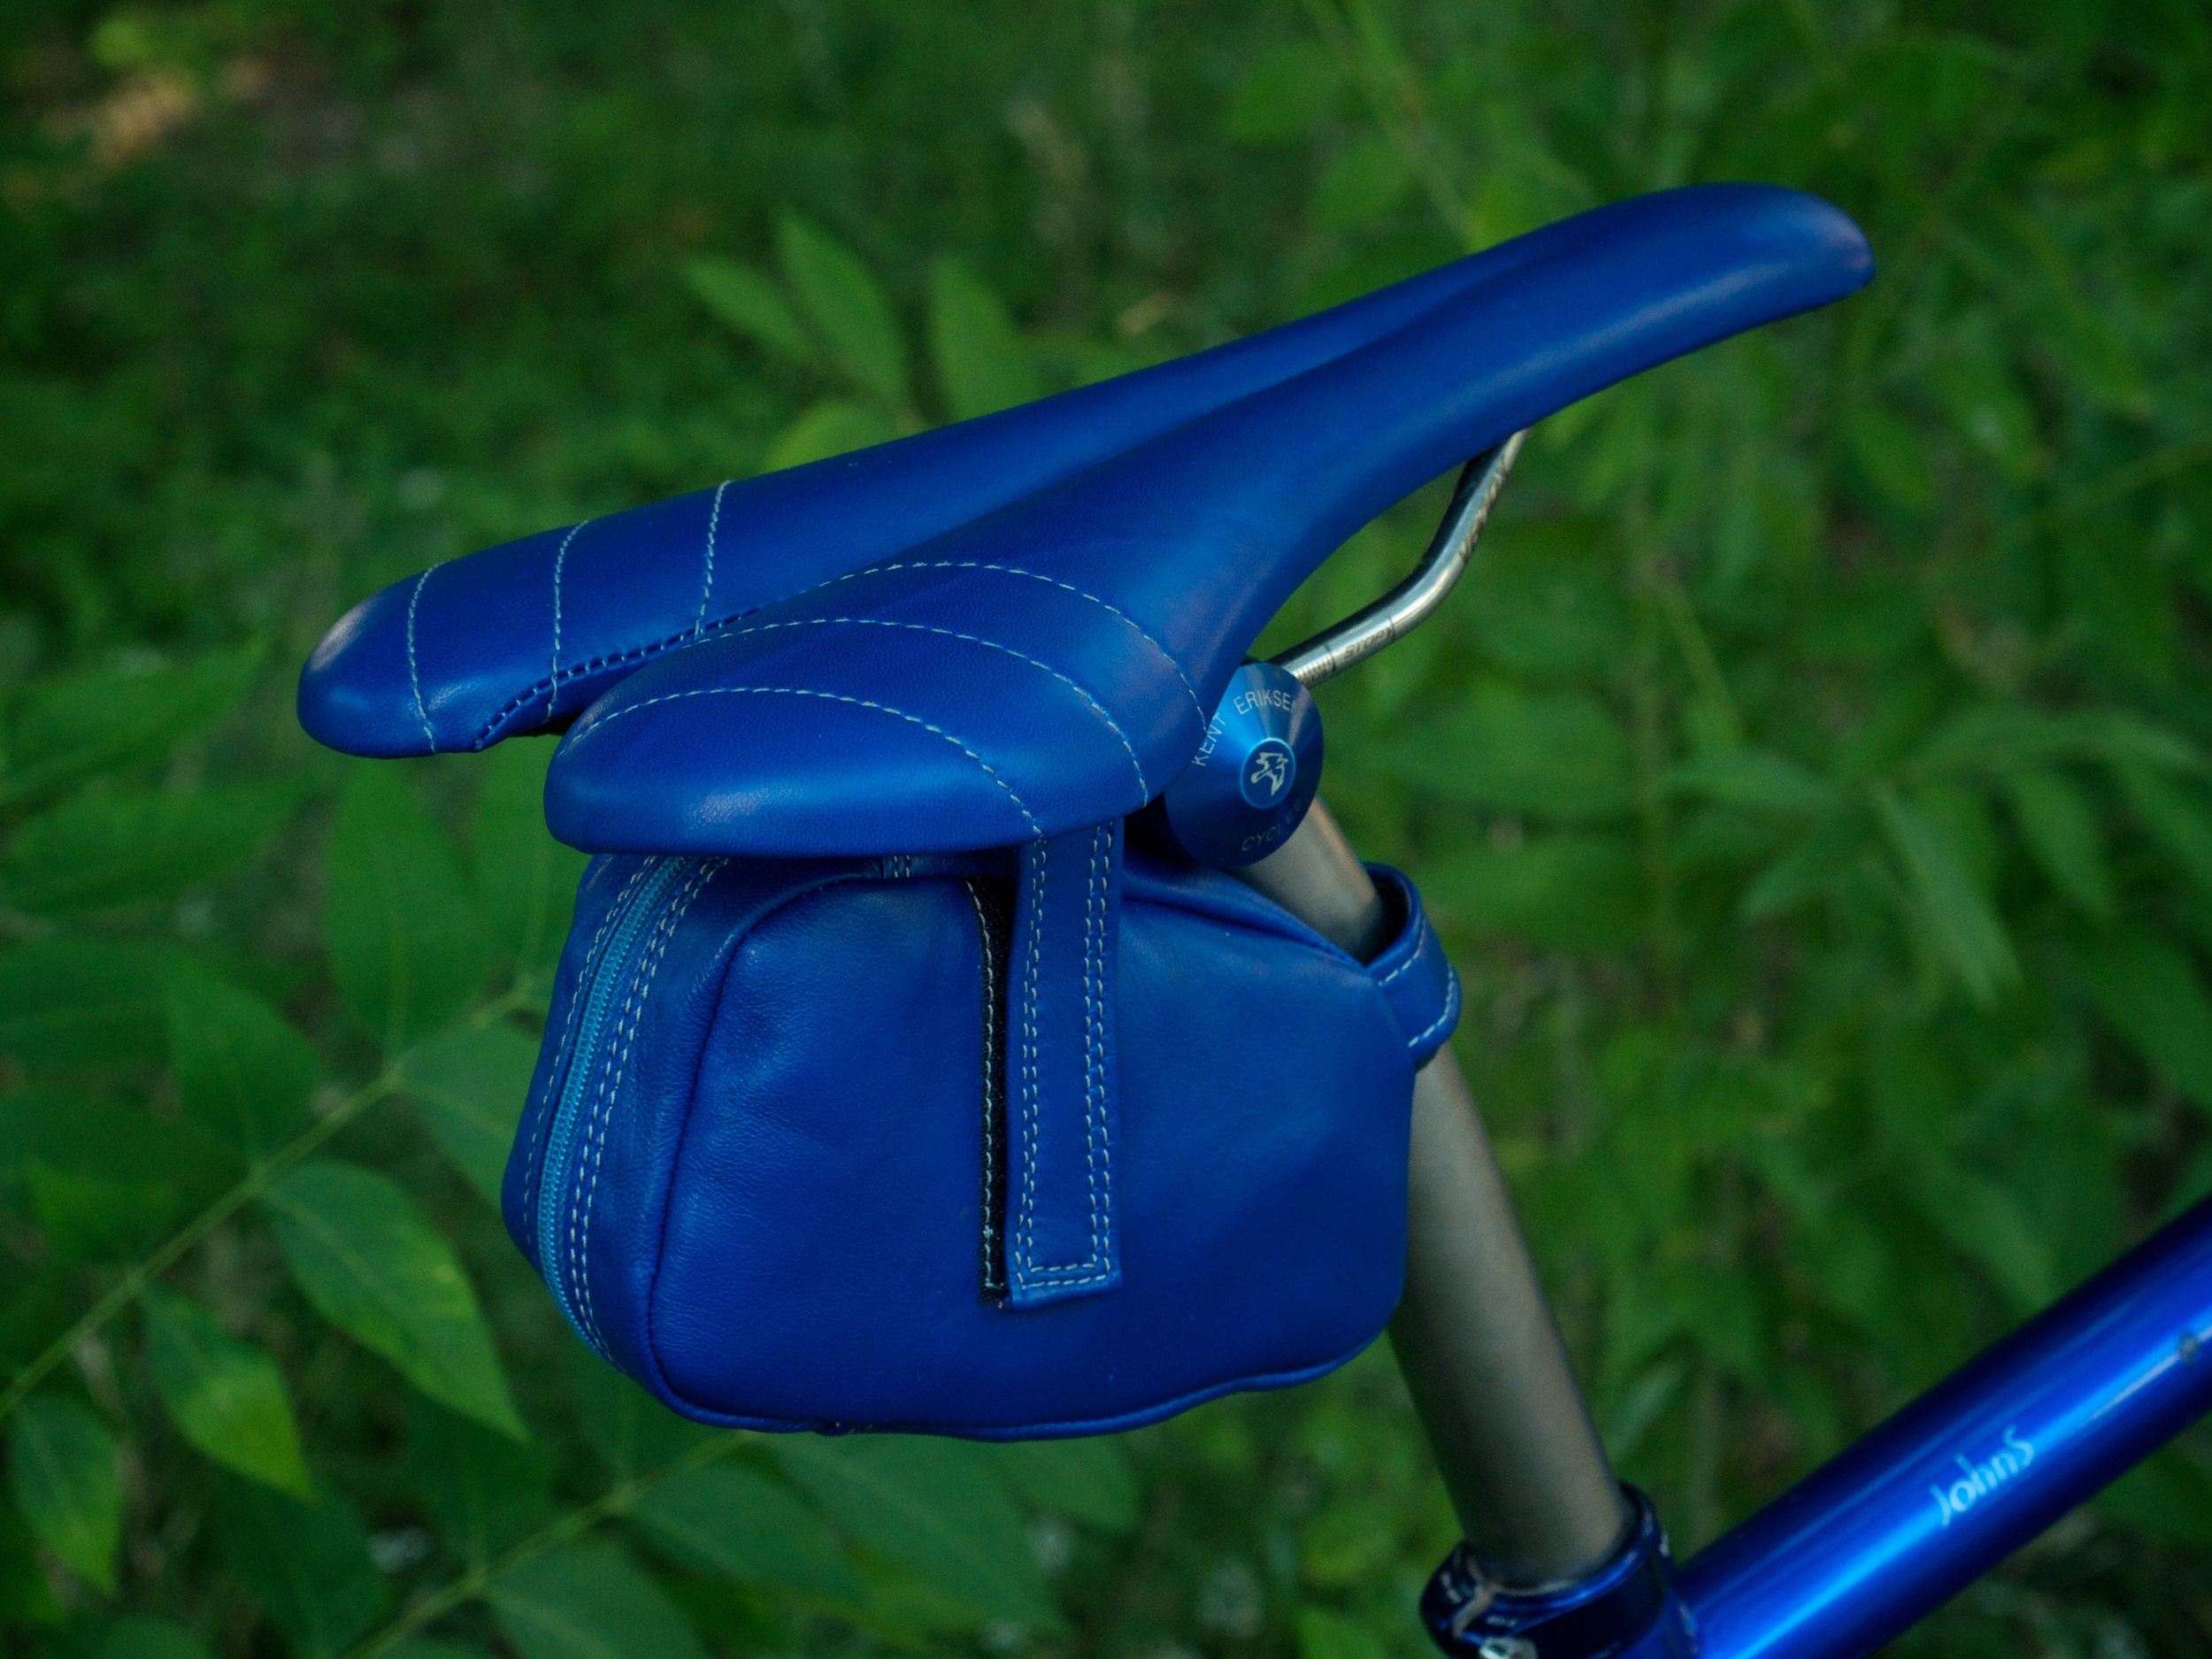 Custom-blue-leather-Selle_Italia-SLK-recover-repair-saddle-bag-handmade-Austin-texas-Willits-eriksen-vintage-brooks-busyman-grey-seat-vintage 2.jpg